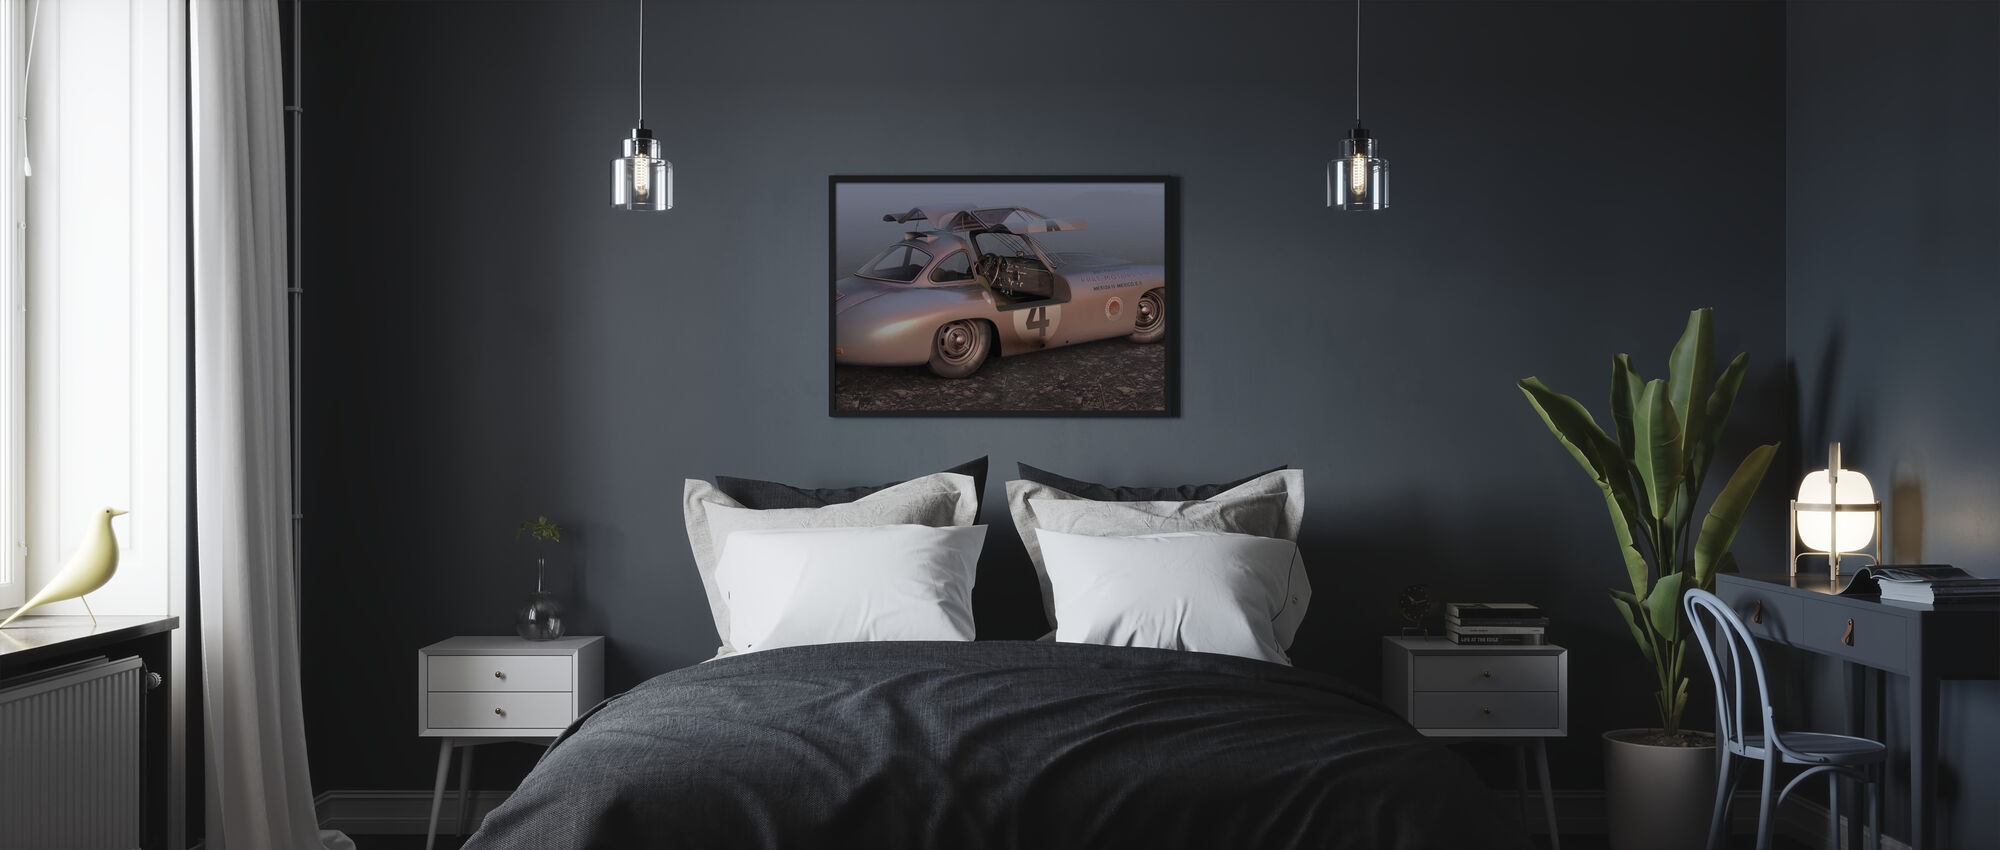 C Panamericana - Poster - Bedroom